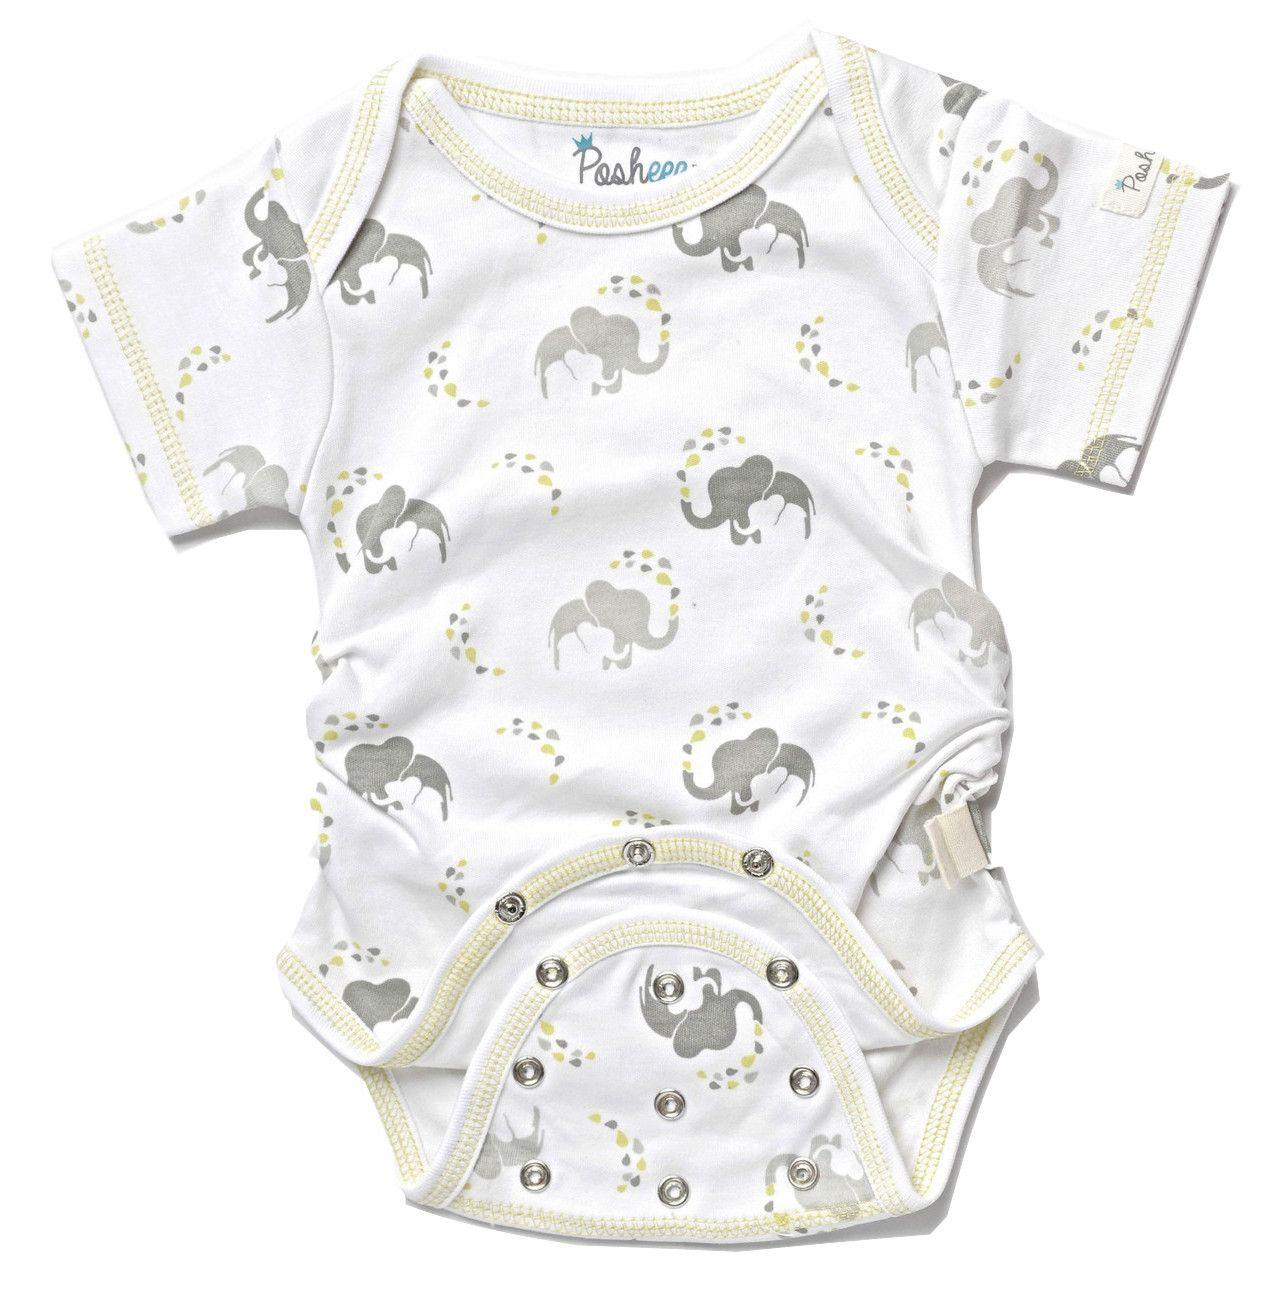 Posheez Snap'n Grow Organic Cotton Adjustable Baby Bodysuit - Elephant Print - Short Sleeve. Any Size, Any Shape ... Perfect Fit! Posheez Fit!